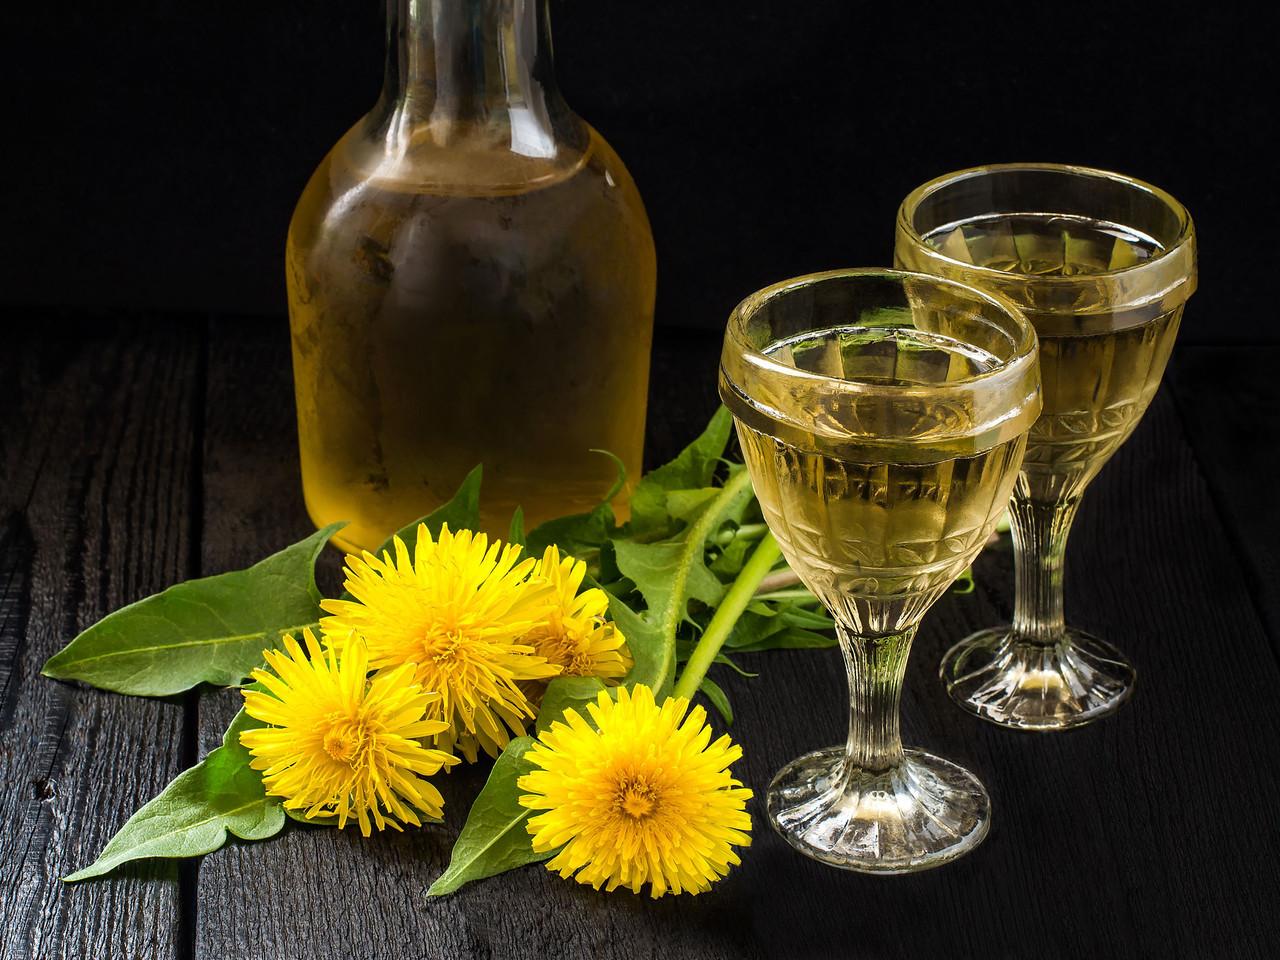 Delcious Dandelion Wine